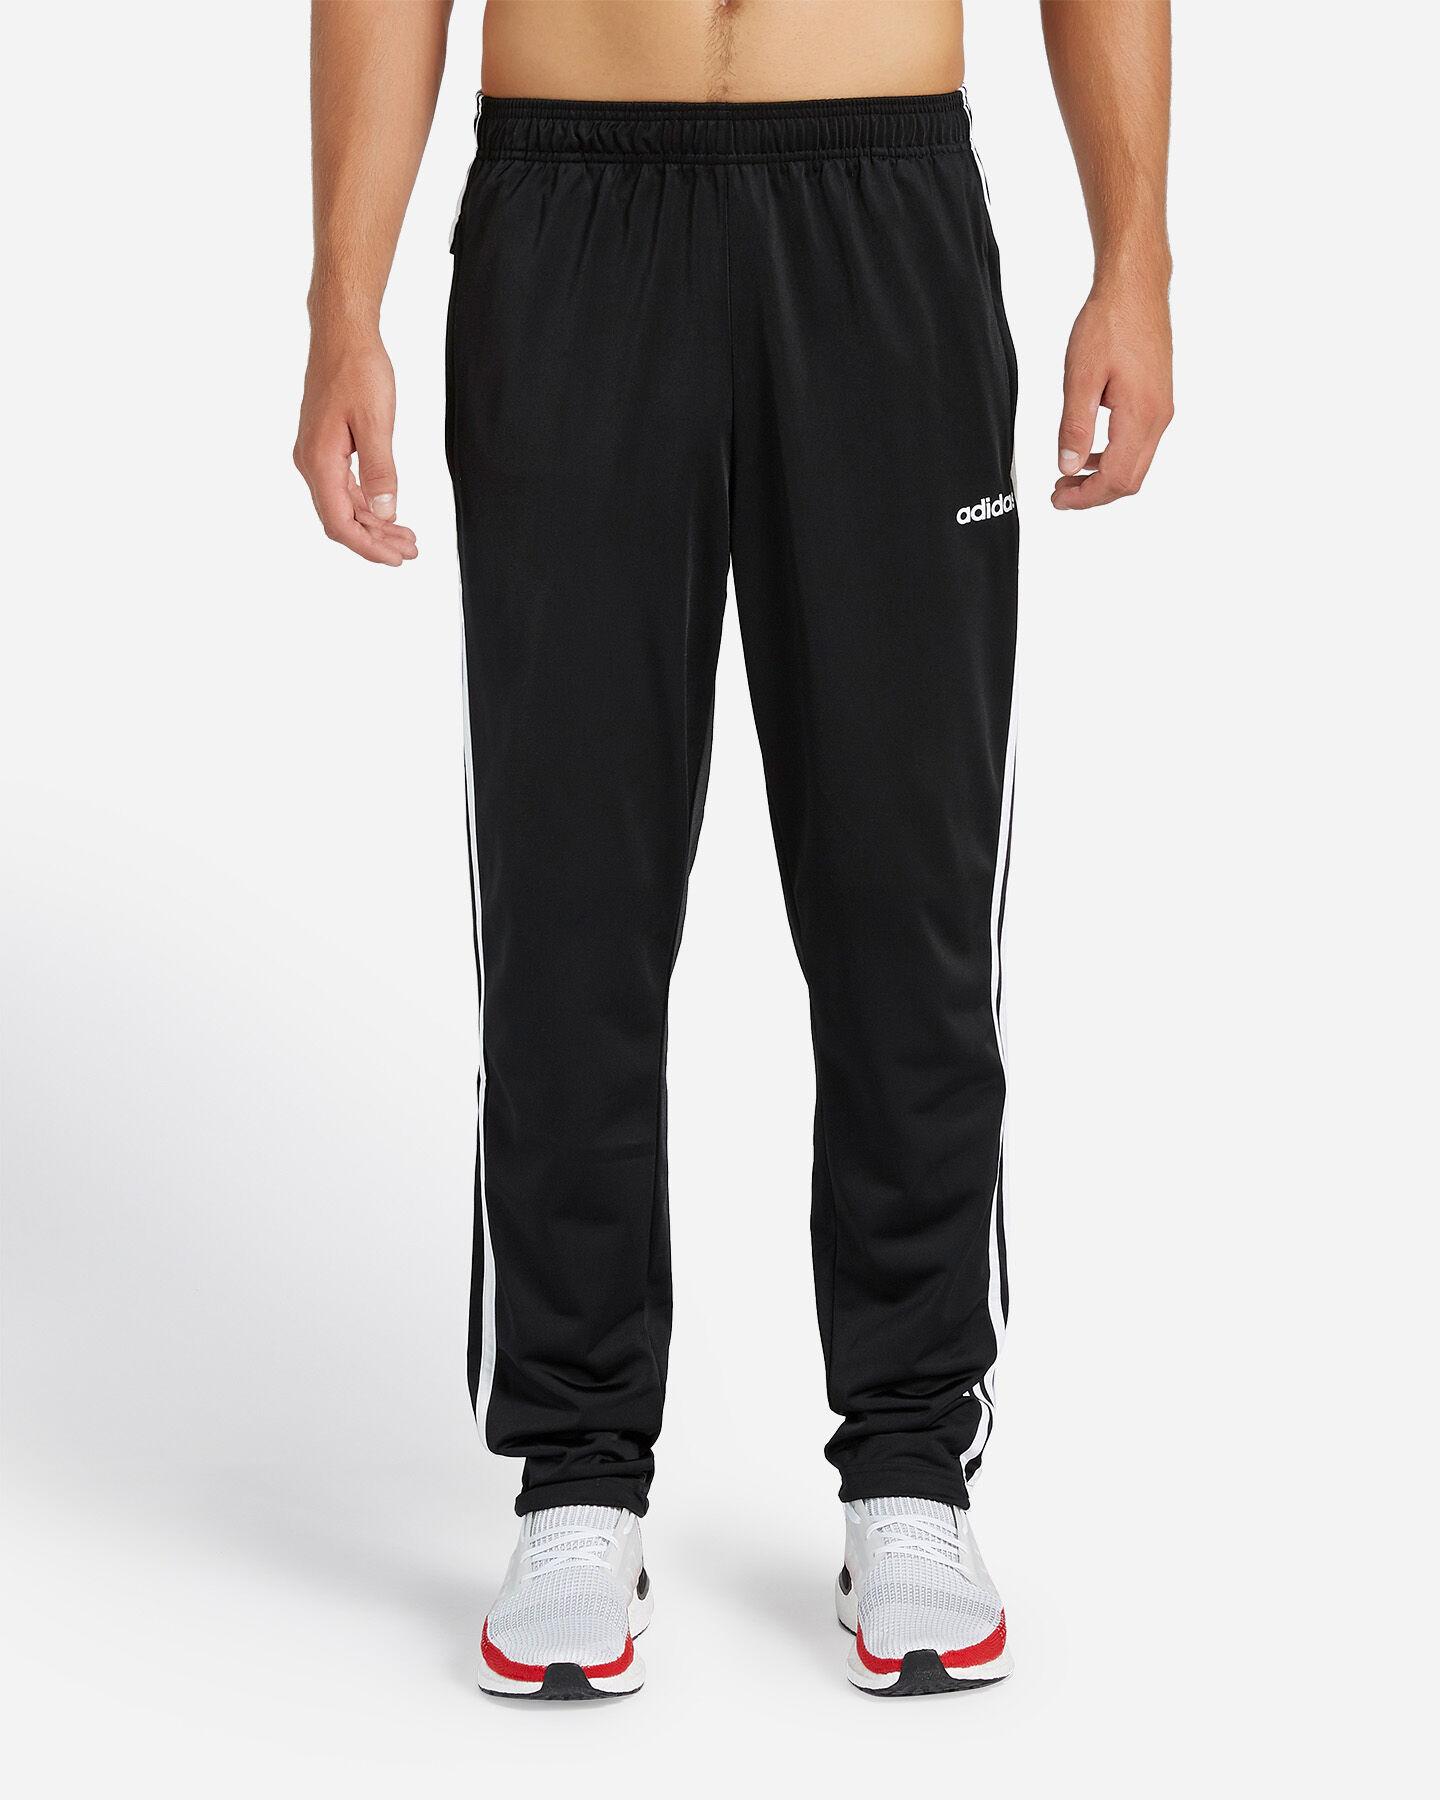 pantaloni adidas uomo 2017 bianco